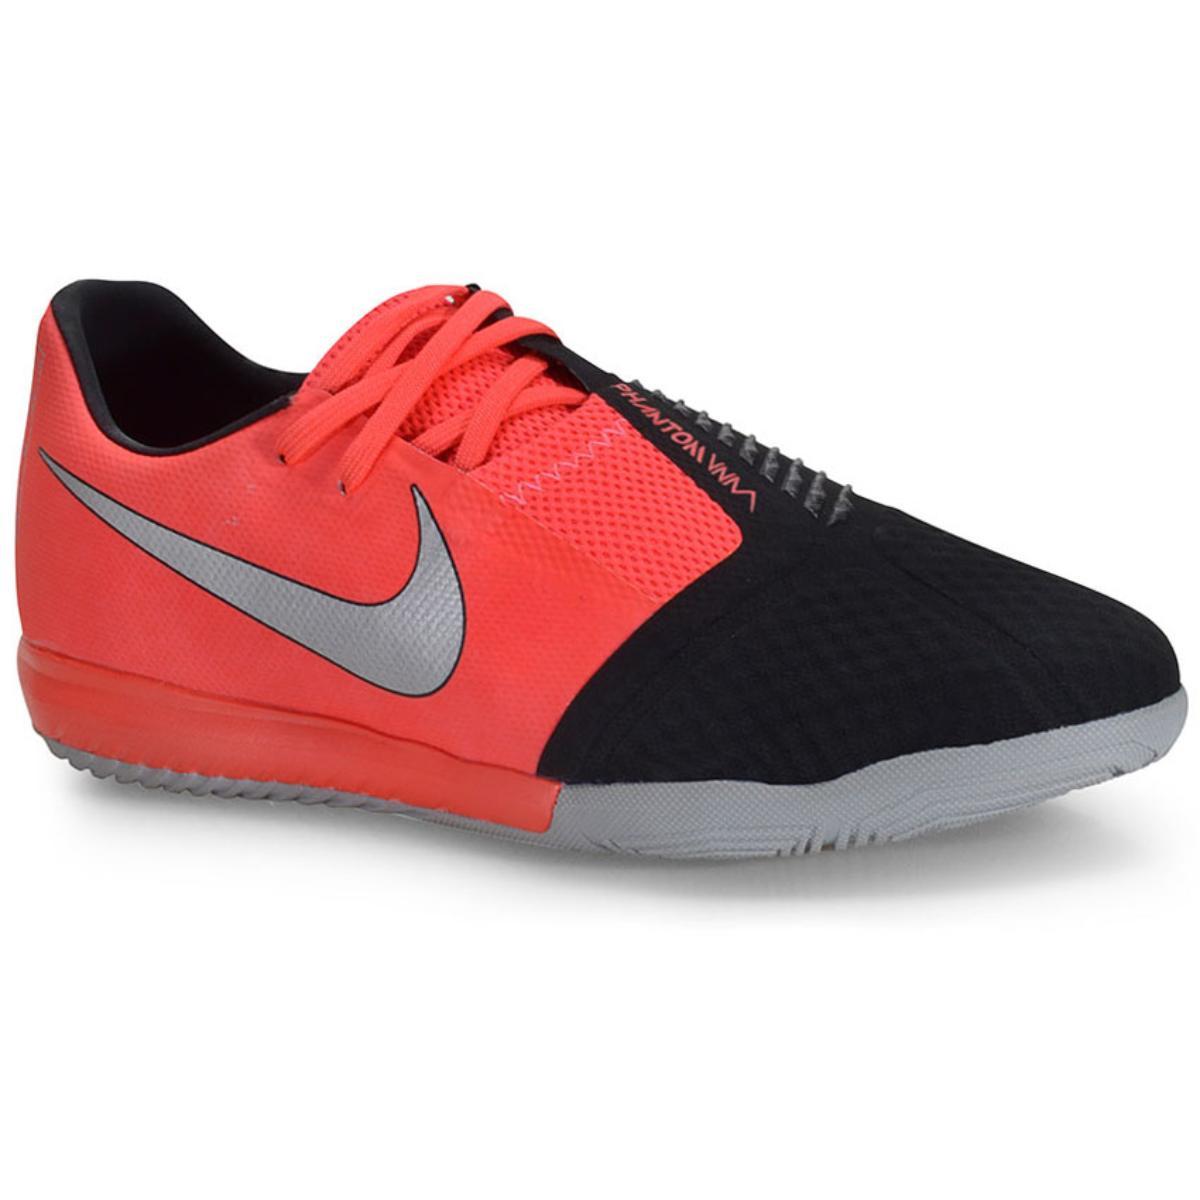 Tênis Masculino Nike Ao0570-606 Phantom Venom Academy ic Preto/vermelho